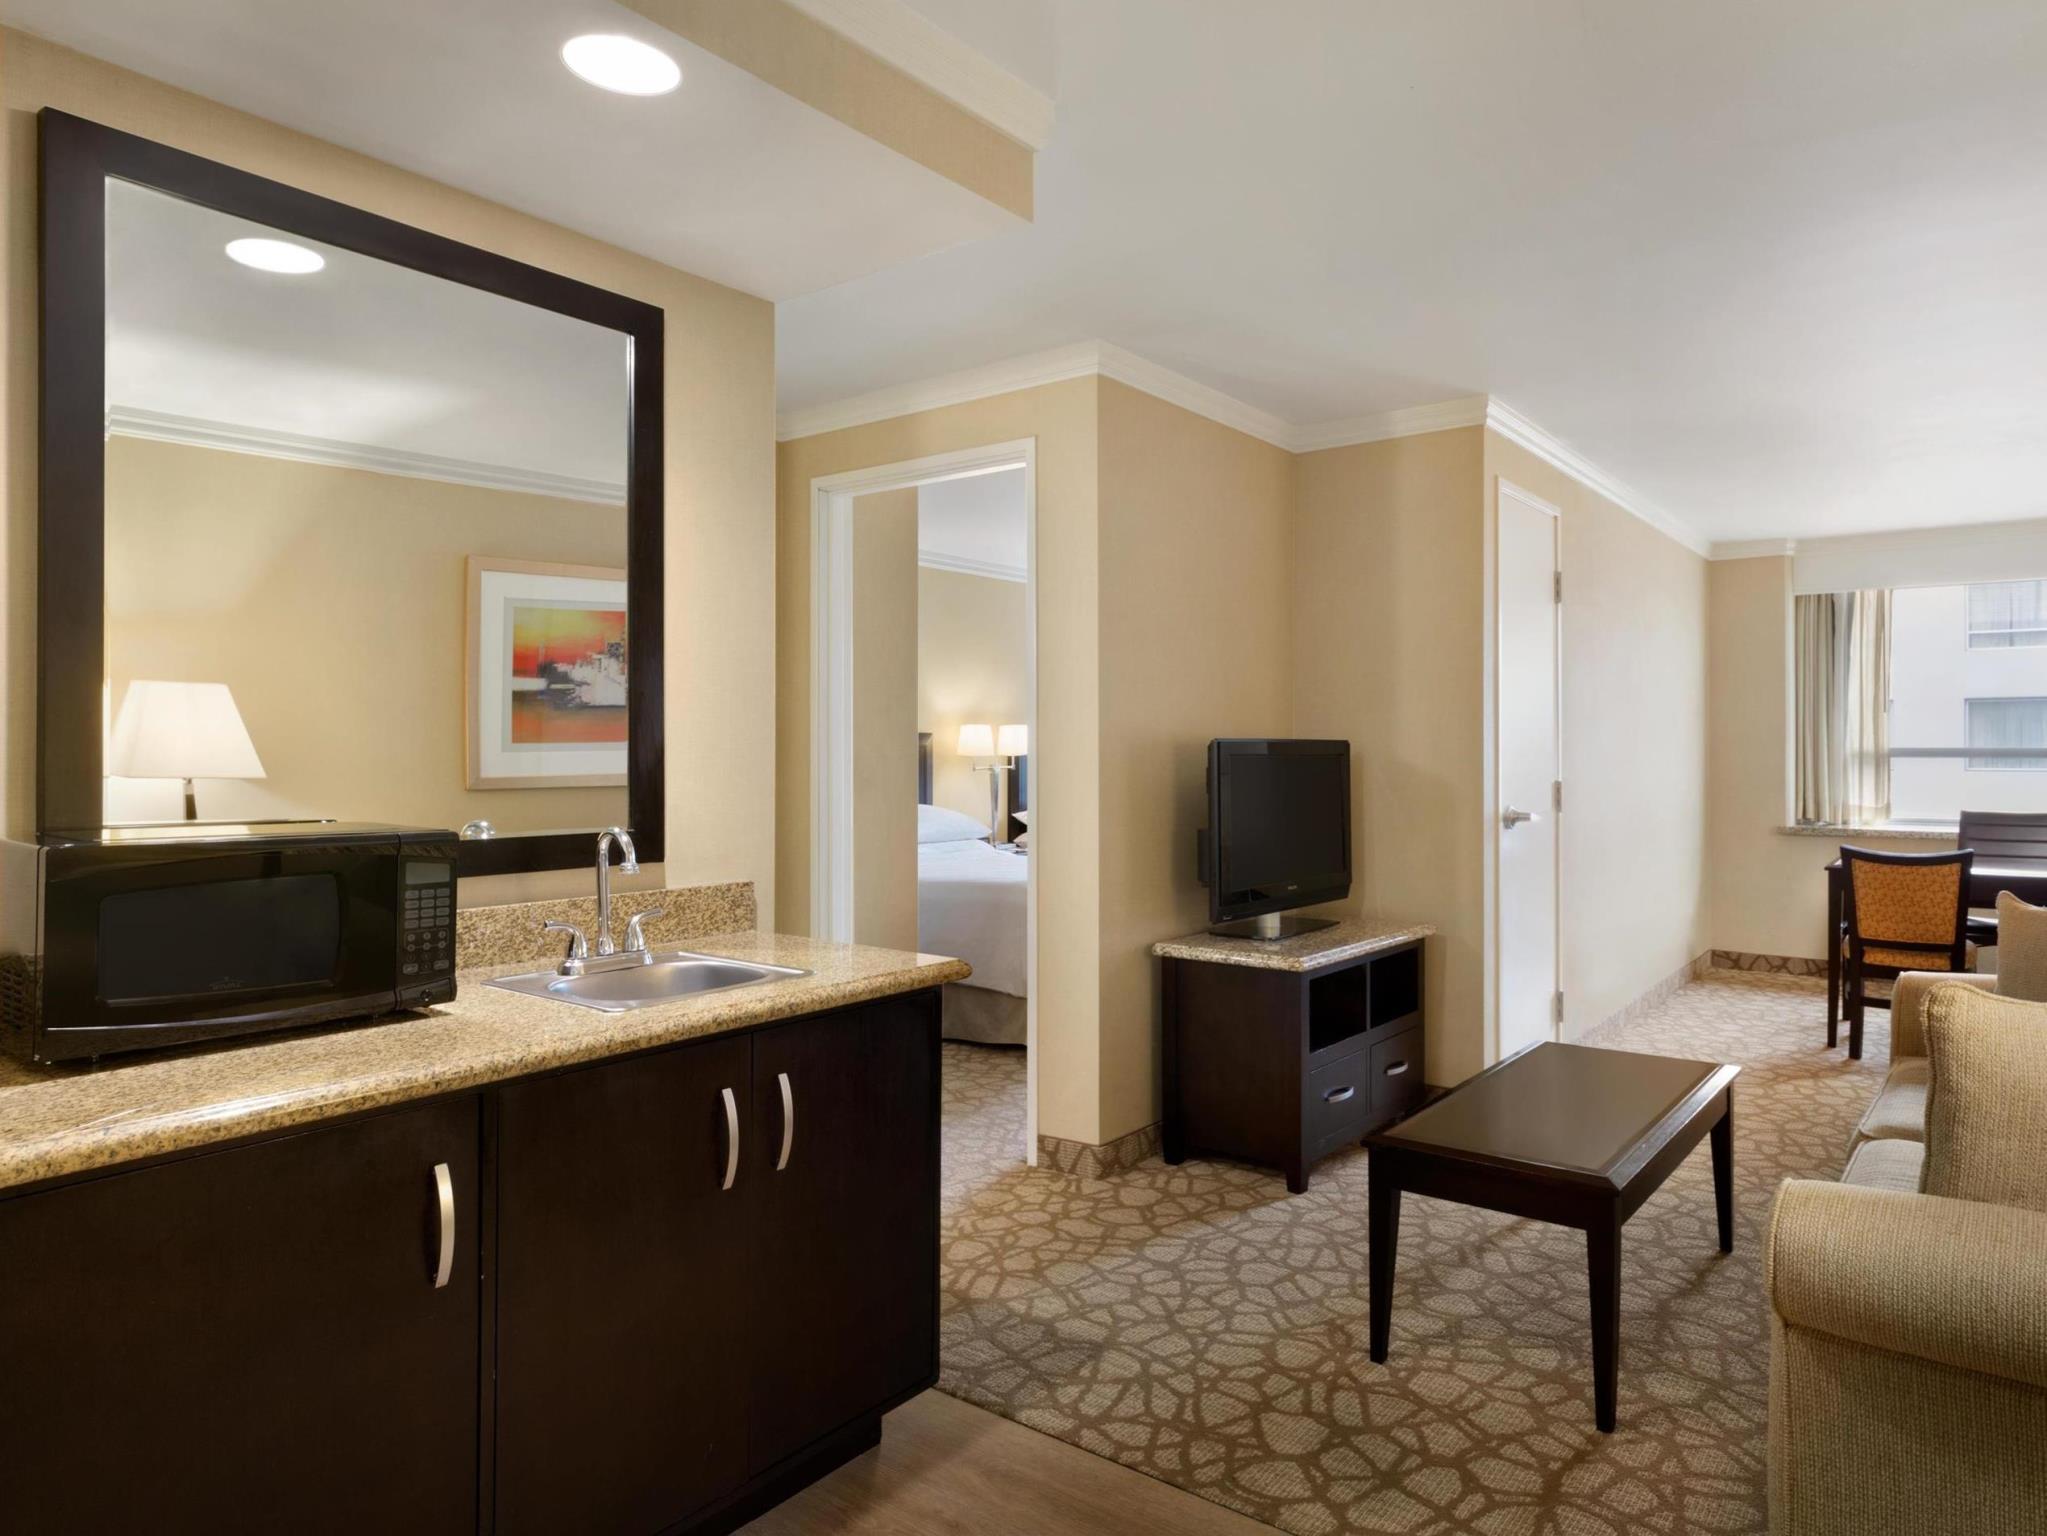 embassy suites los angeles glendale hotel in los angeles. Black Bedroom Furniture Sets. Home Design Ideas